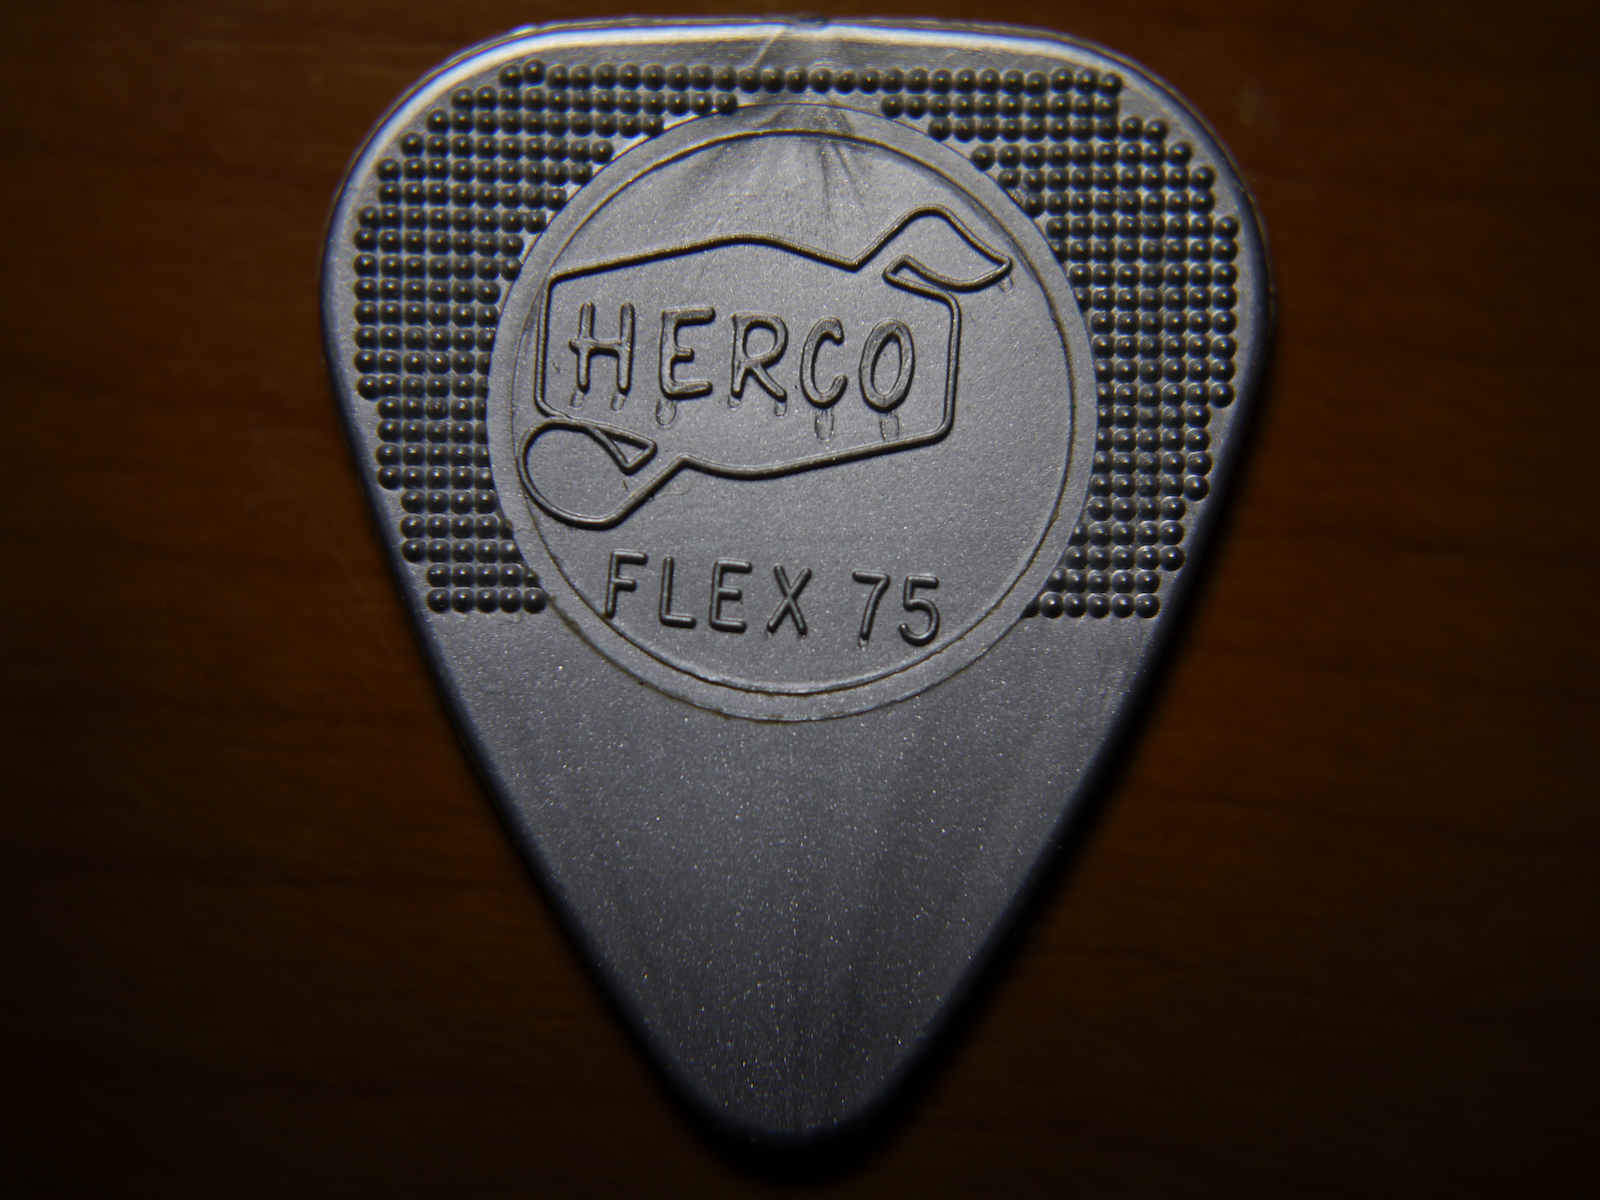 FileHERCO FLEX 75 Guitar Pick